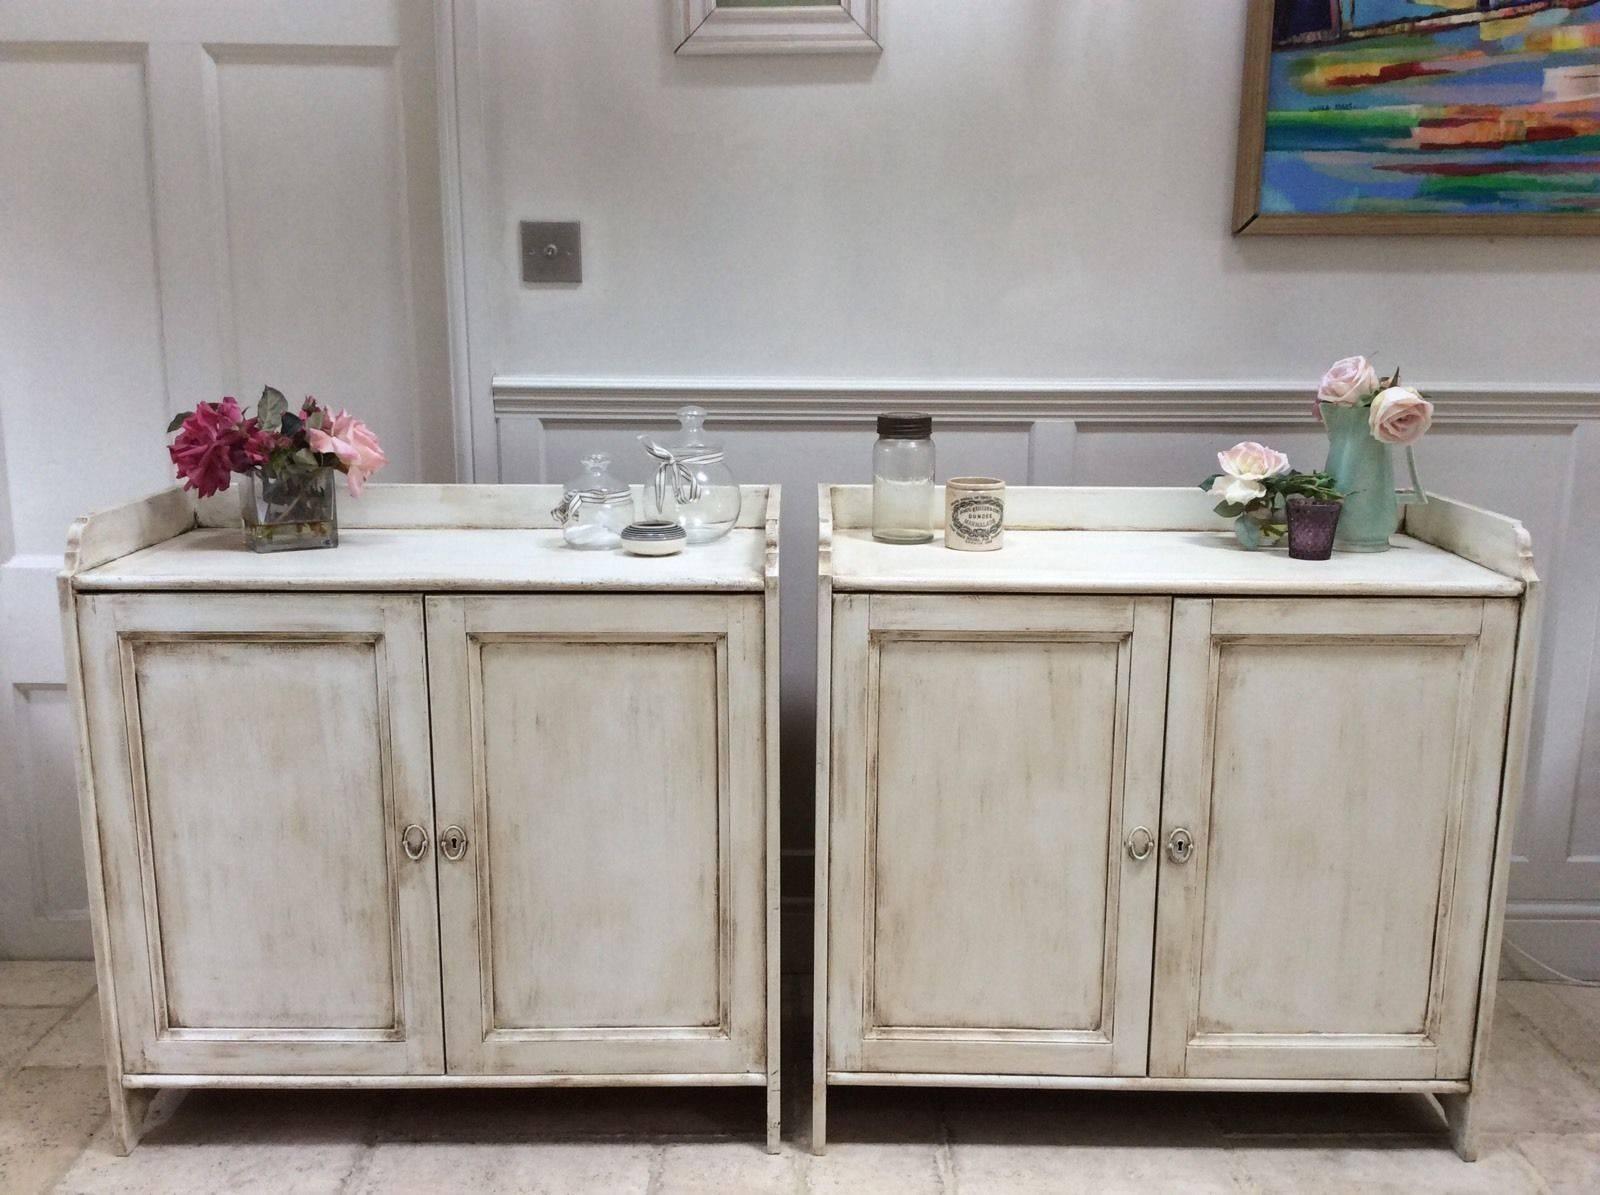 Pair Of Pine Painted Cream Sideboard Freestanding Kitchen Unit With Free Standing Kitchen Sideboard (View 2 of 20)